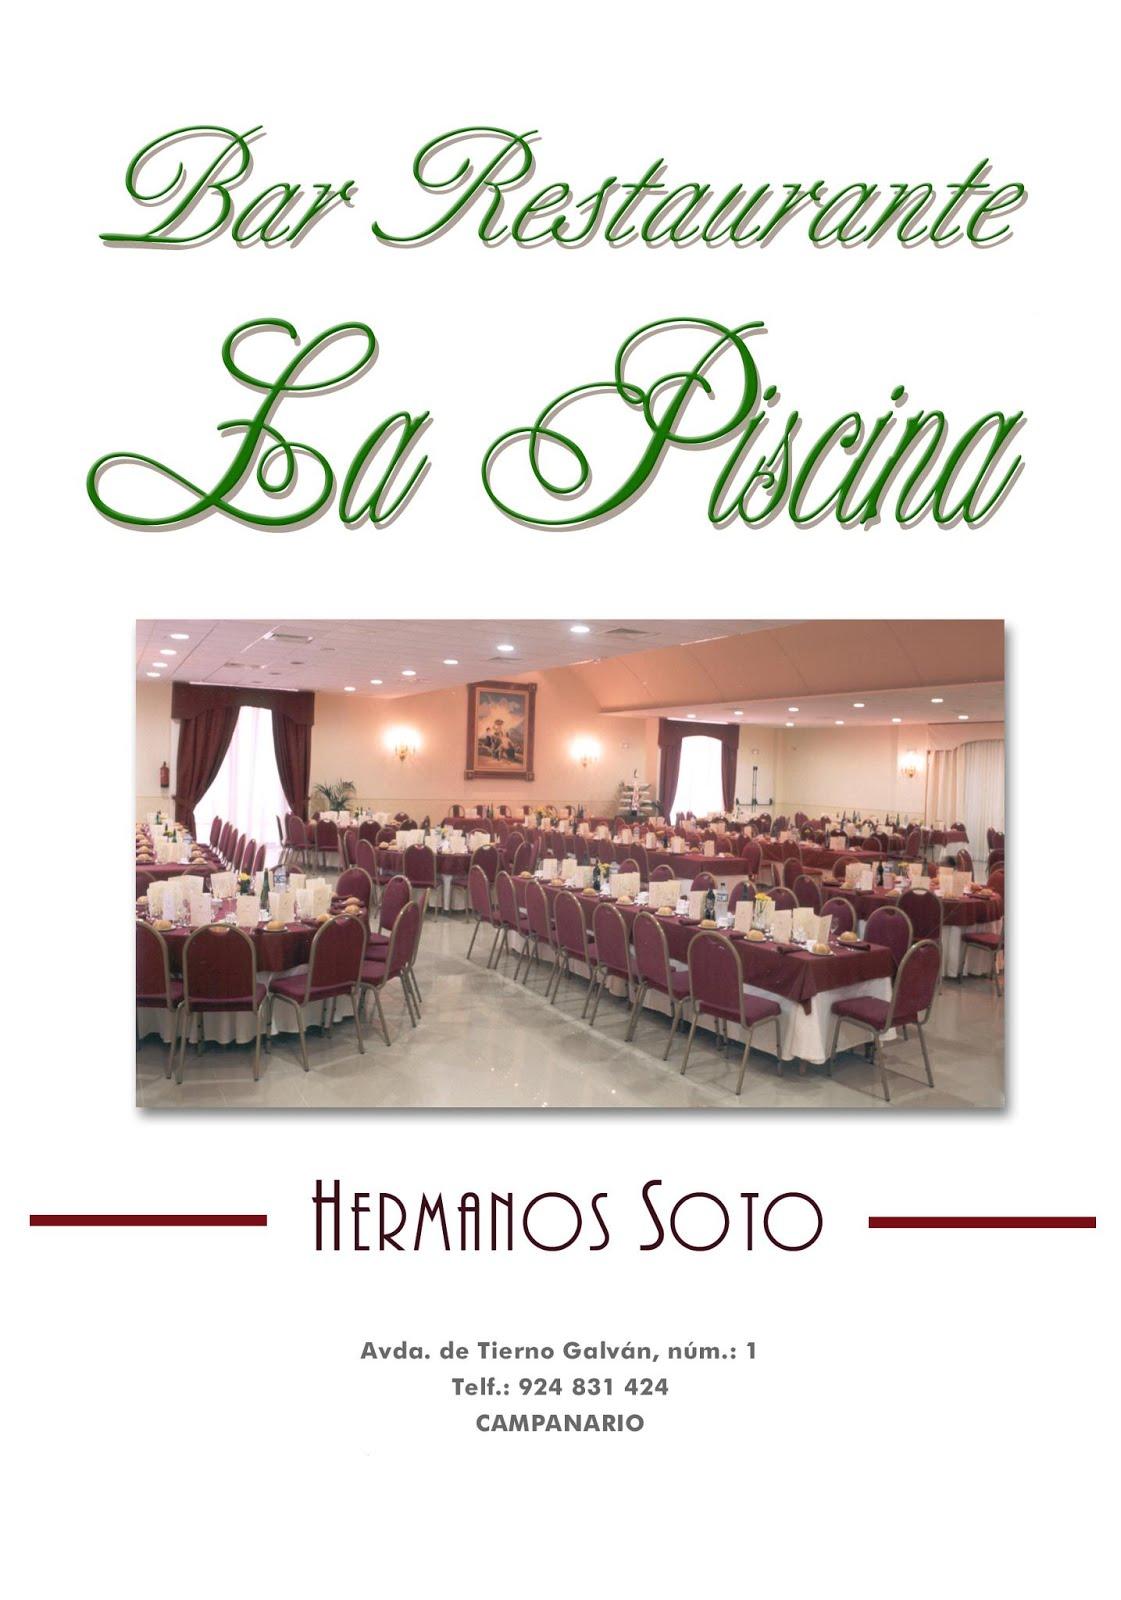 Restaurante La Piscina - Hnos Soto